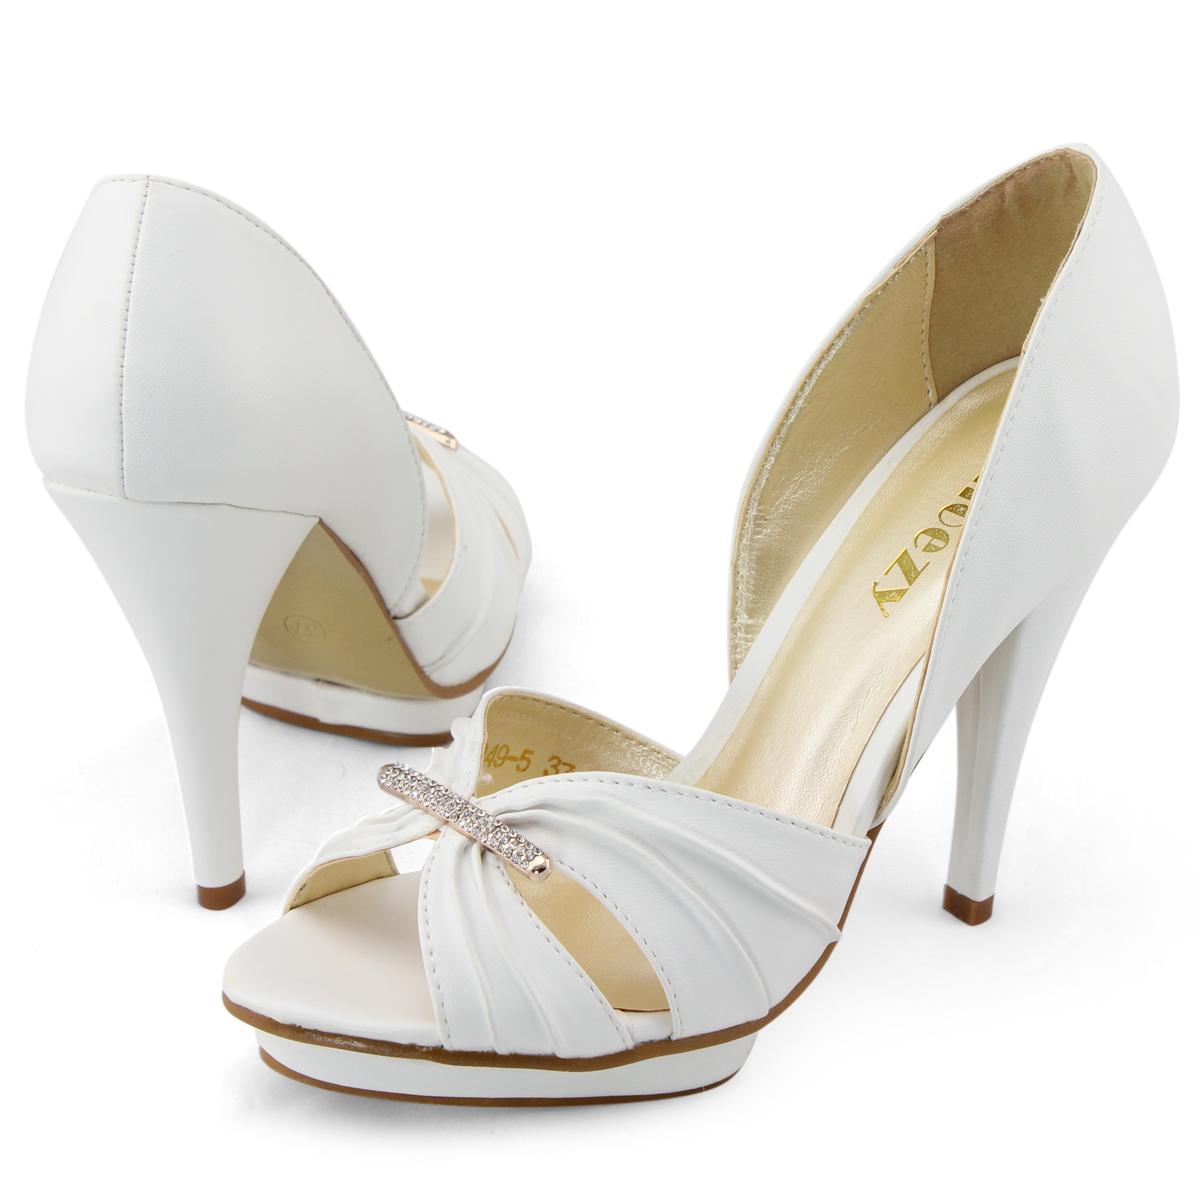 shoezy womens white diamante peep toes platform pumps high